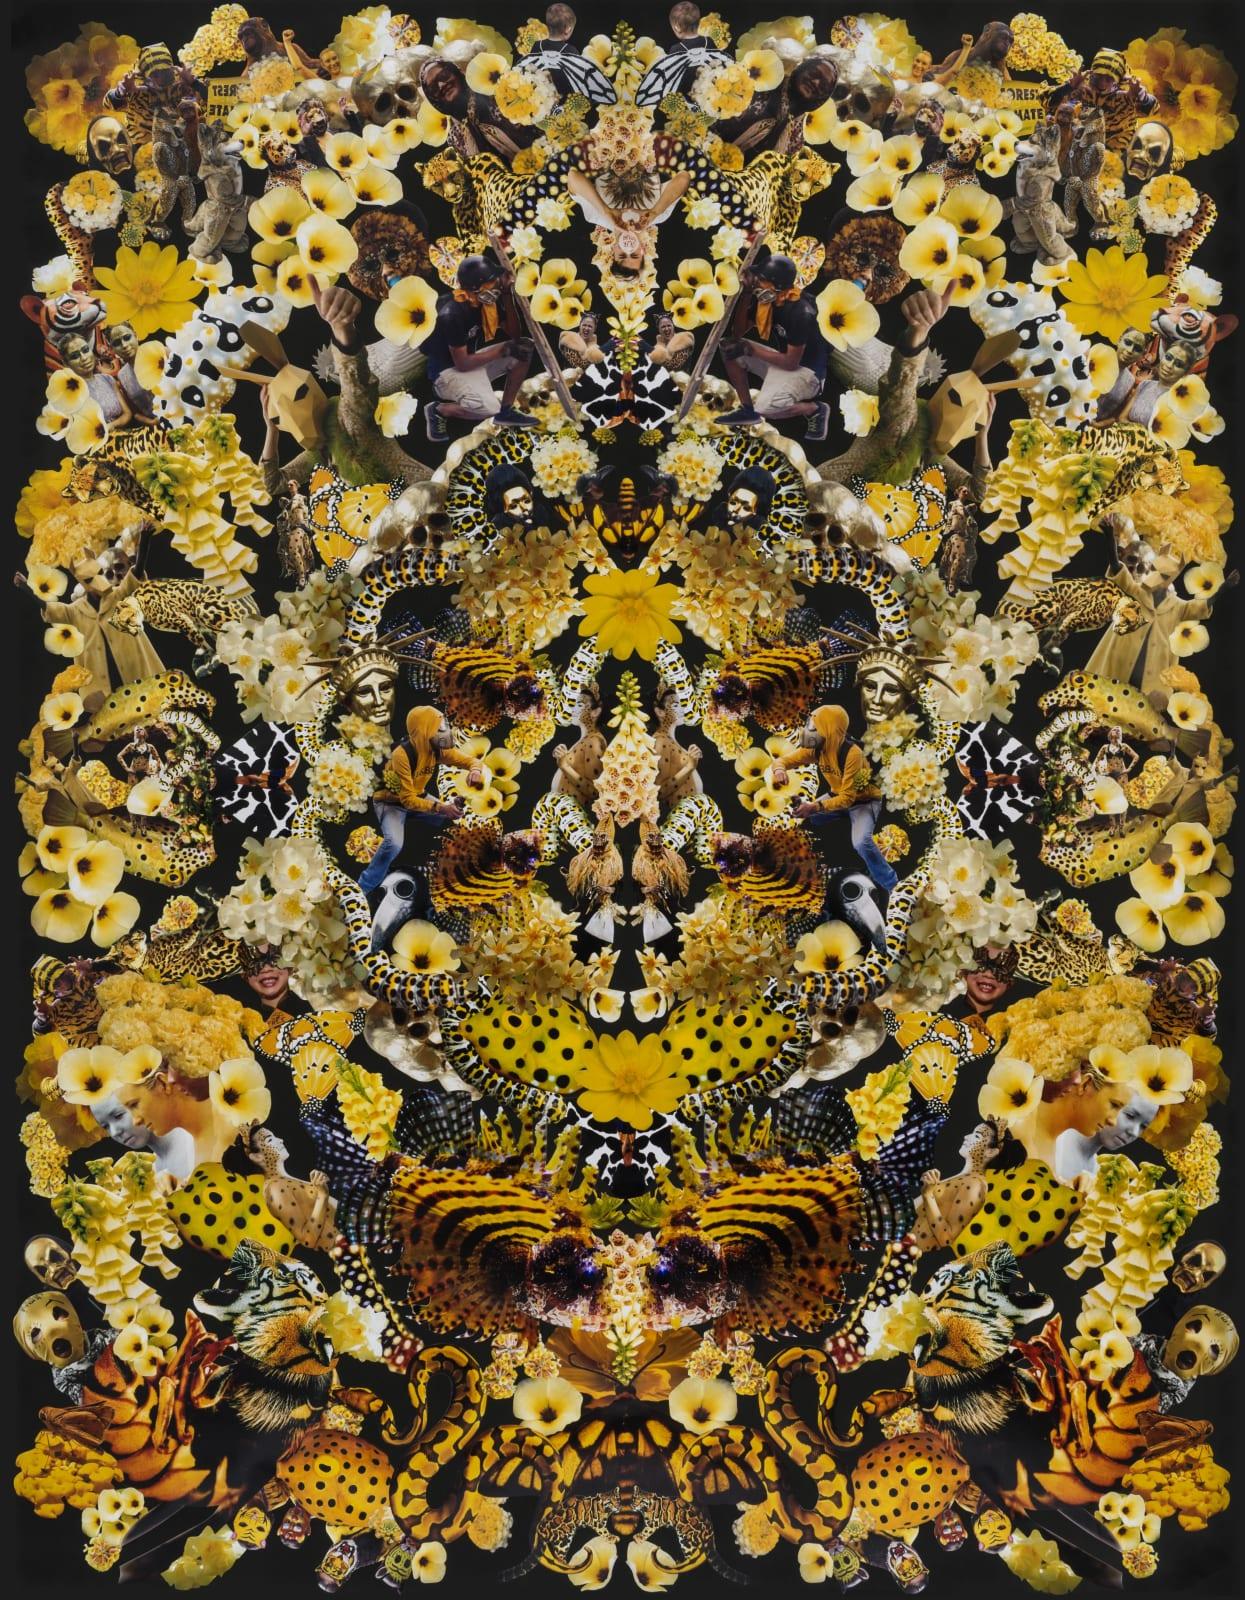 Jemima Wyman, Flourish 7, 2020 hand cut photos on paper, 52 x 40 in